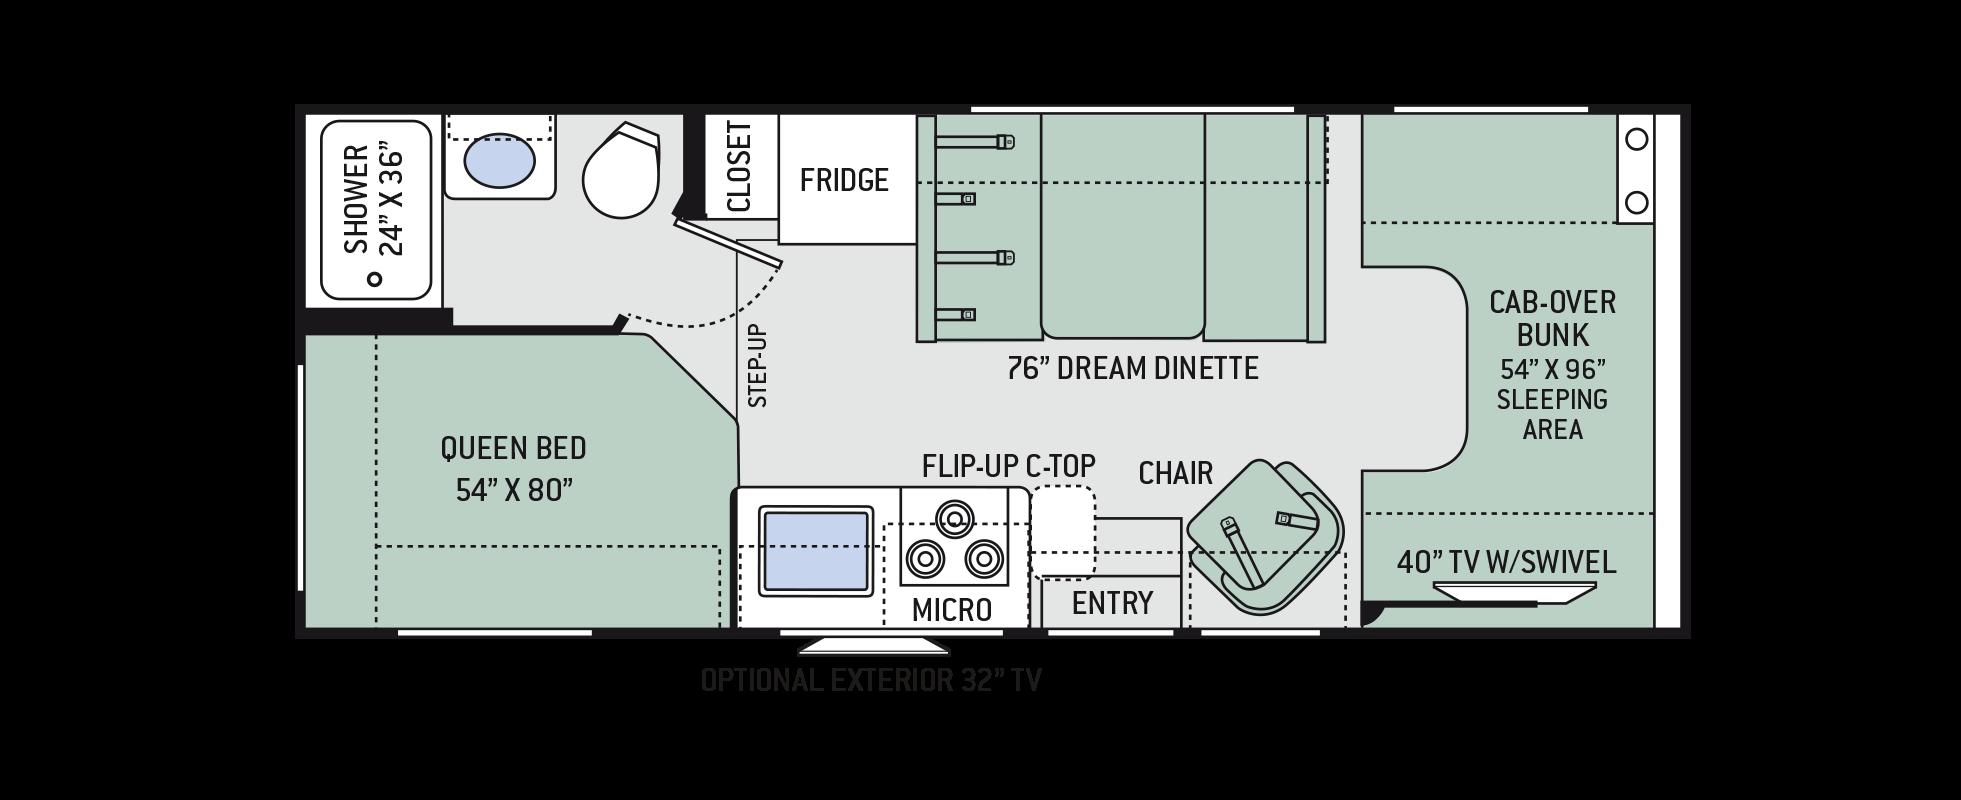 Thor Four Winds Wiring Diagram Electrical Diagrams Motorhome Chateau 23u House Goshen Coach